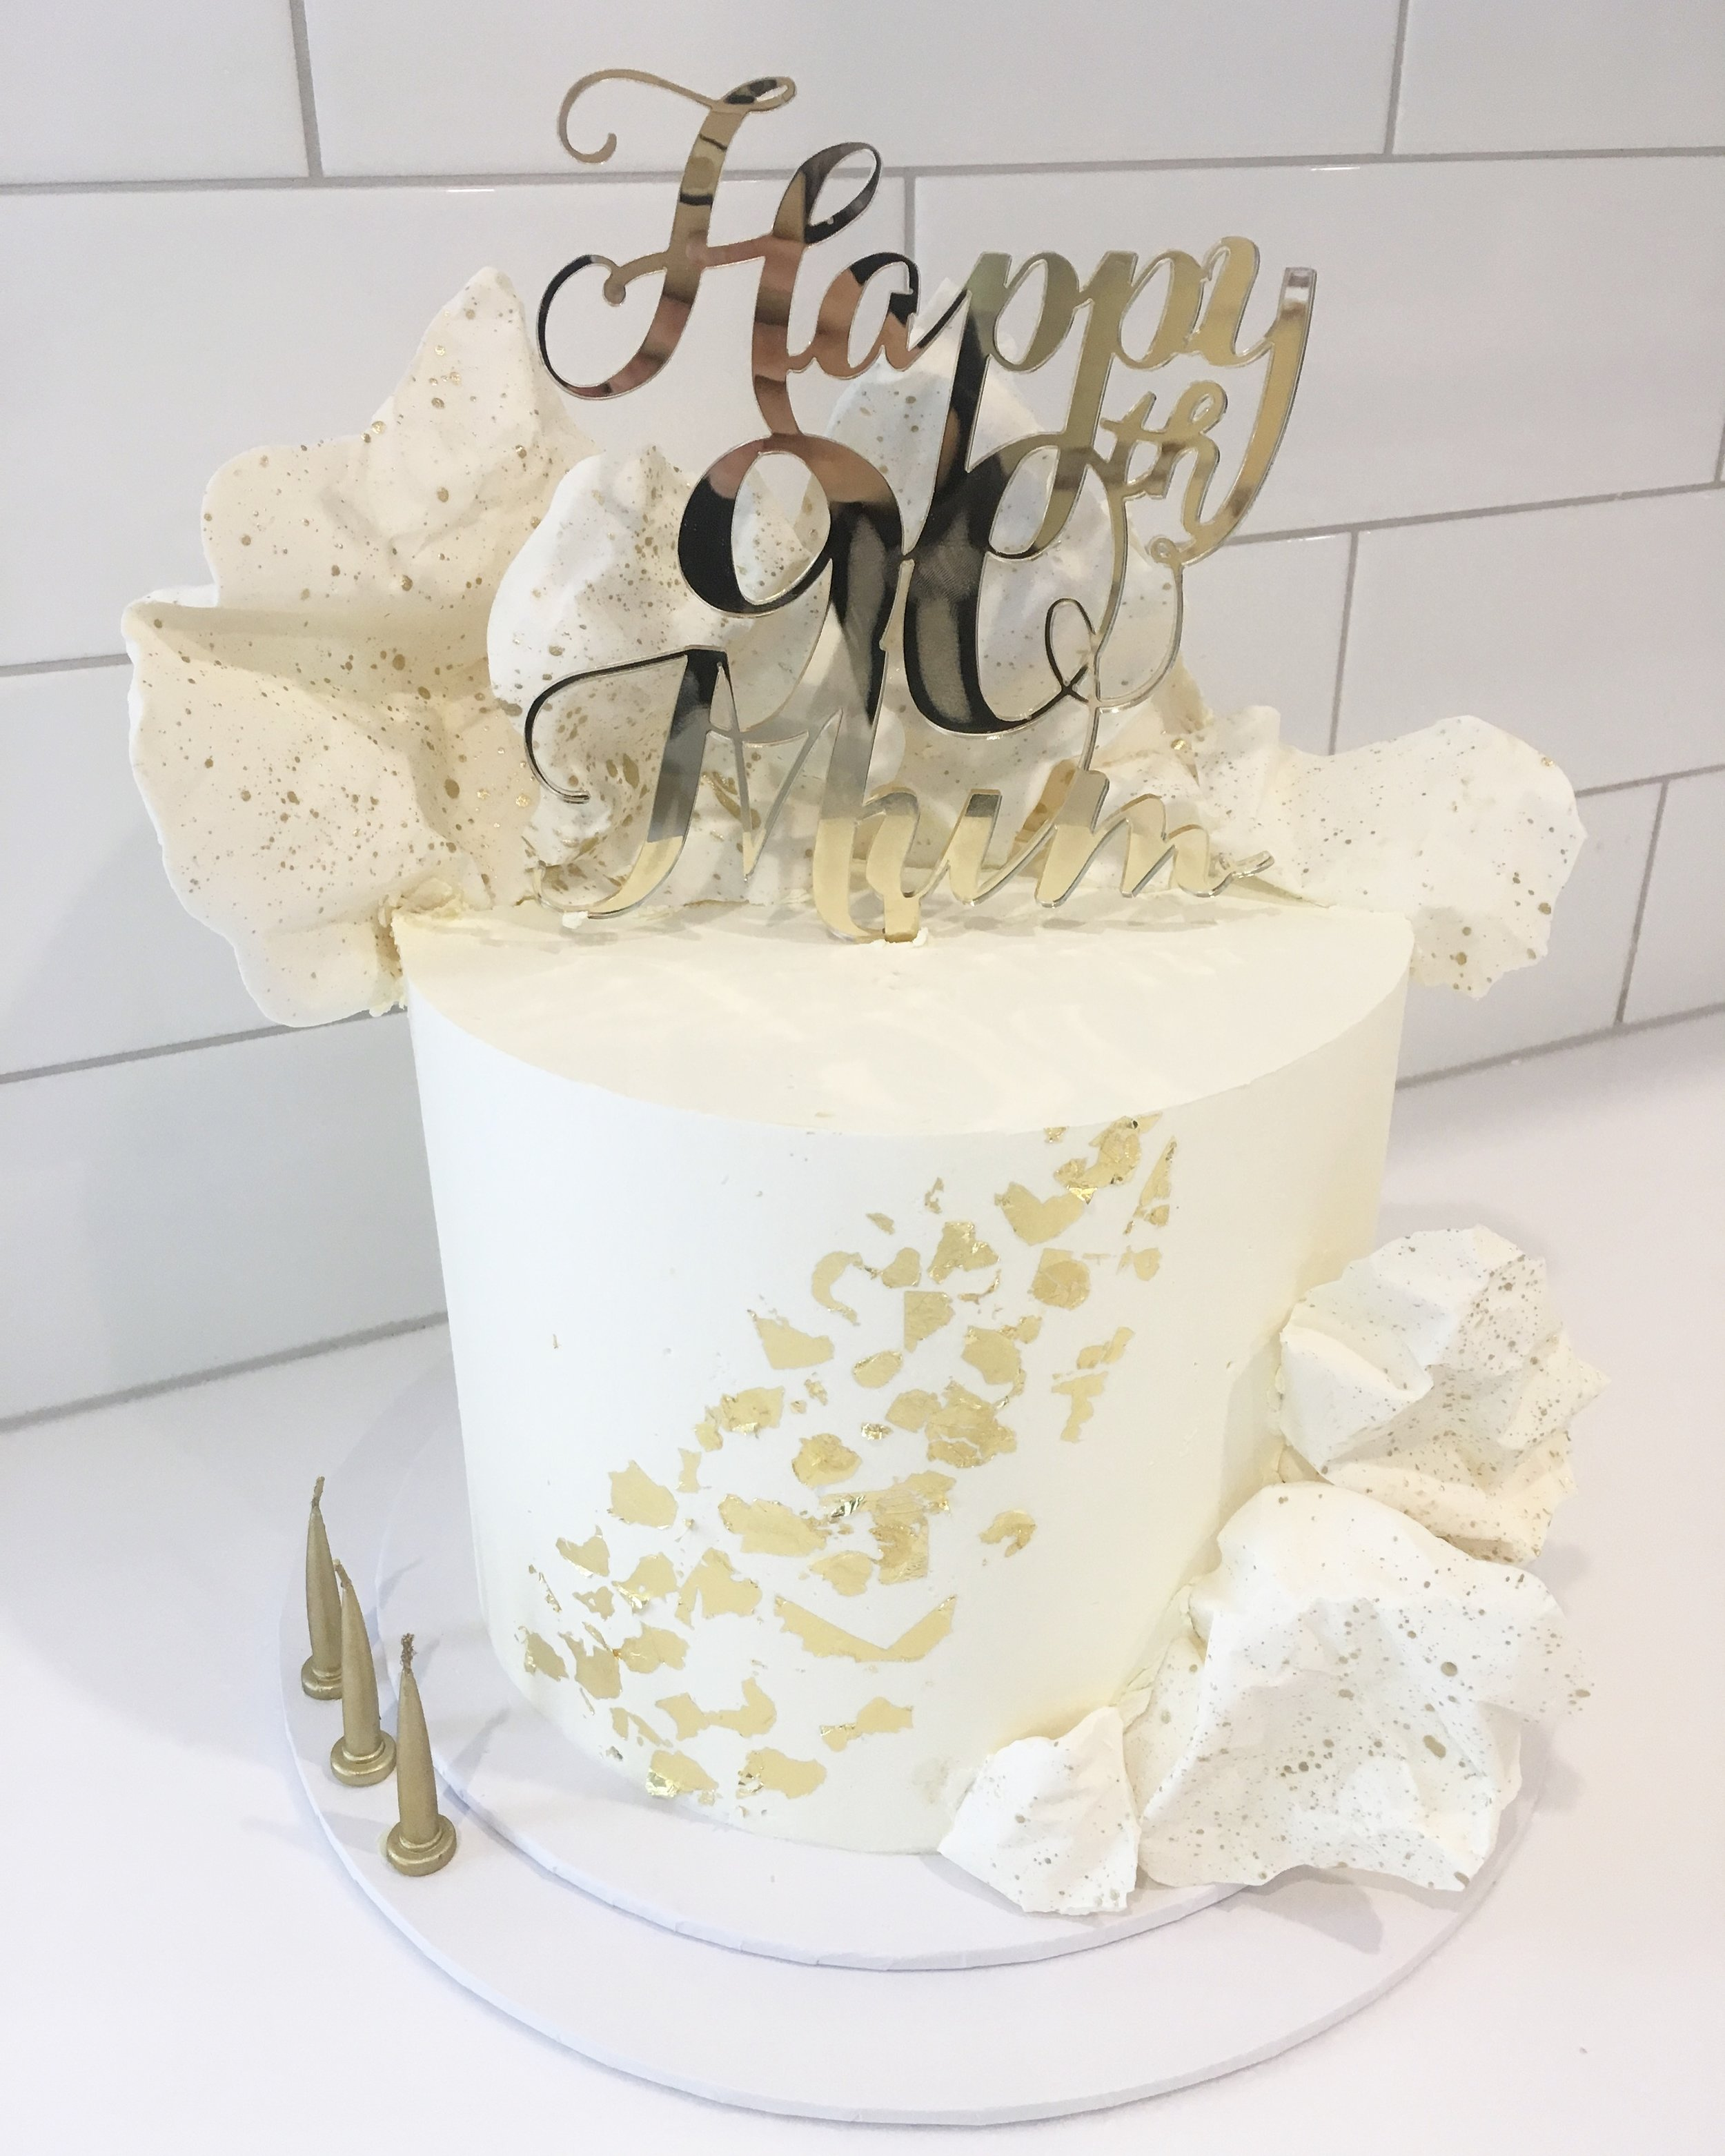 Birthday Cake with Chocolate Sails